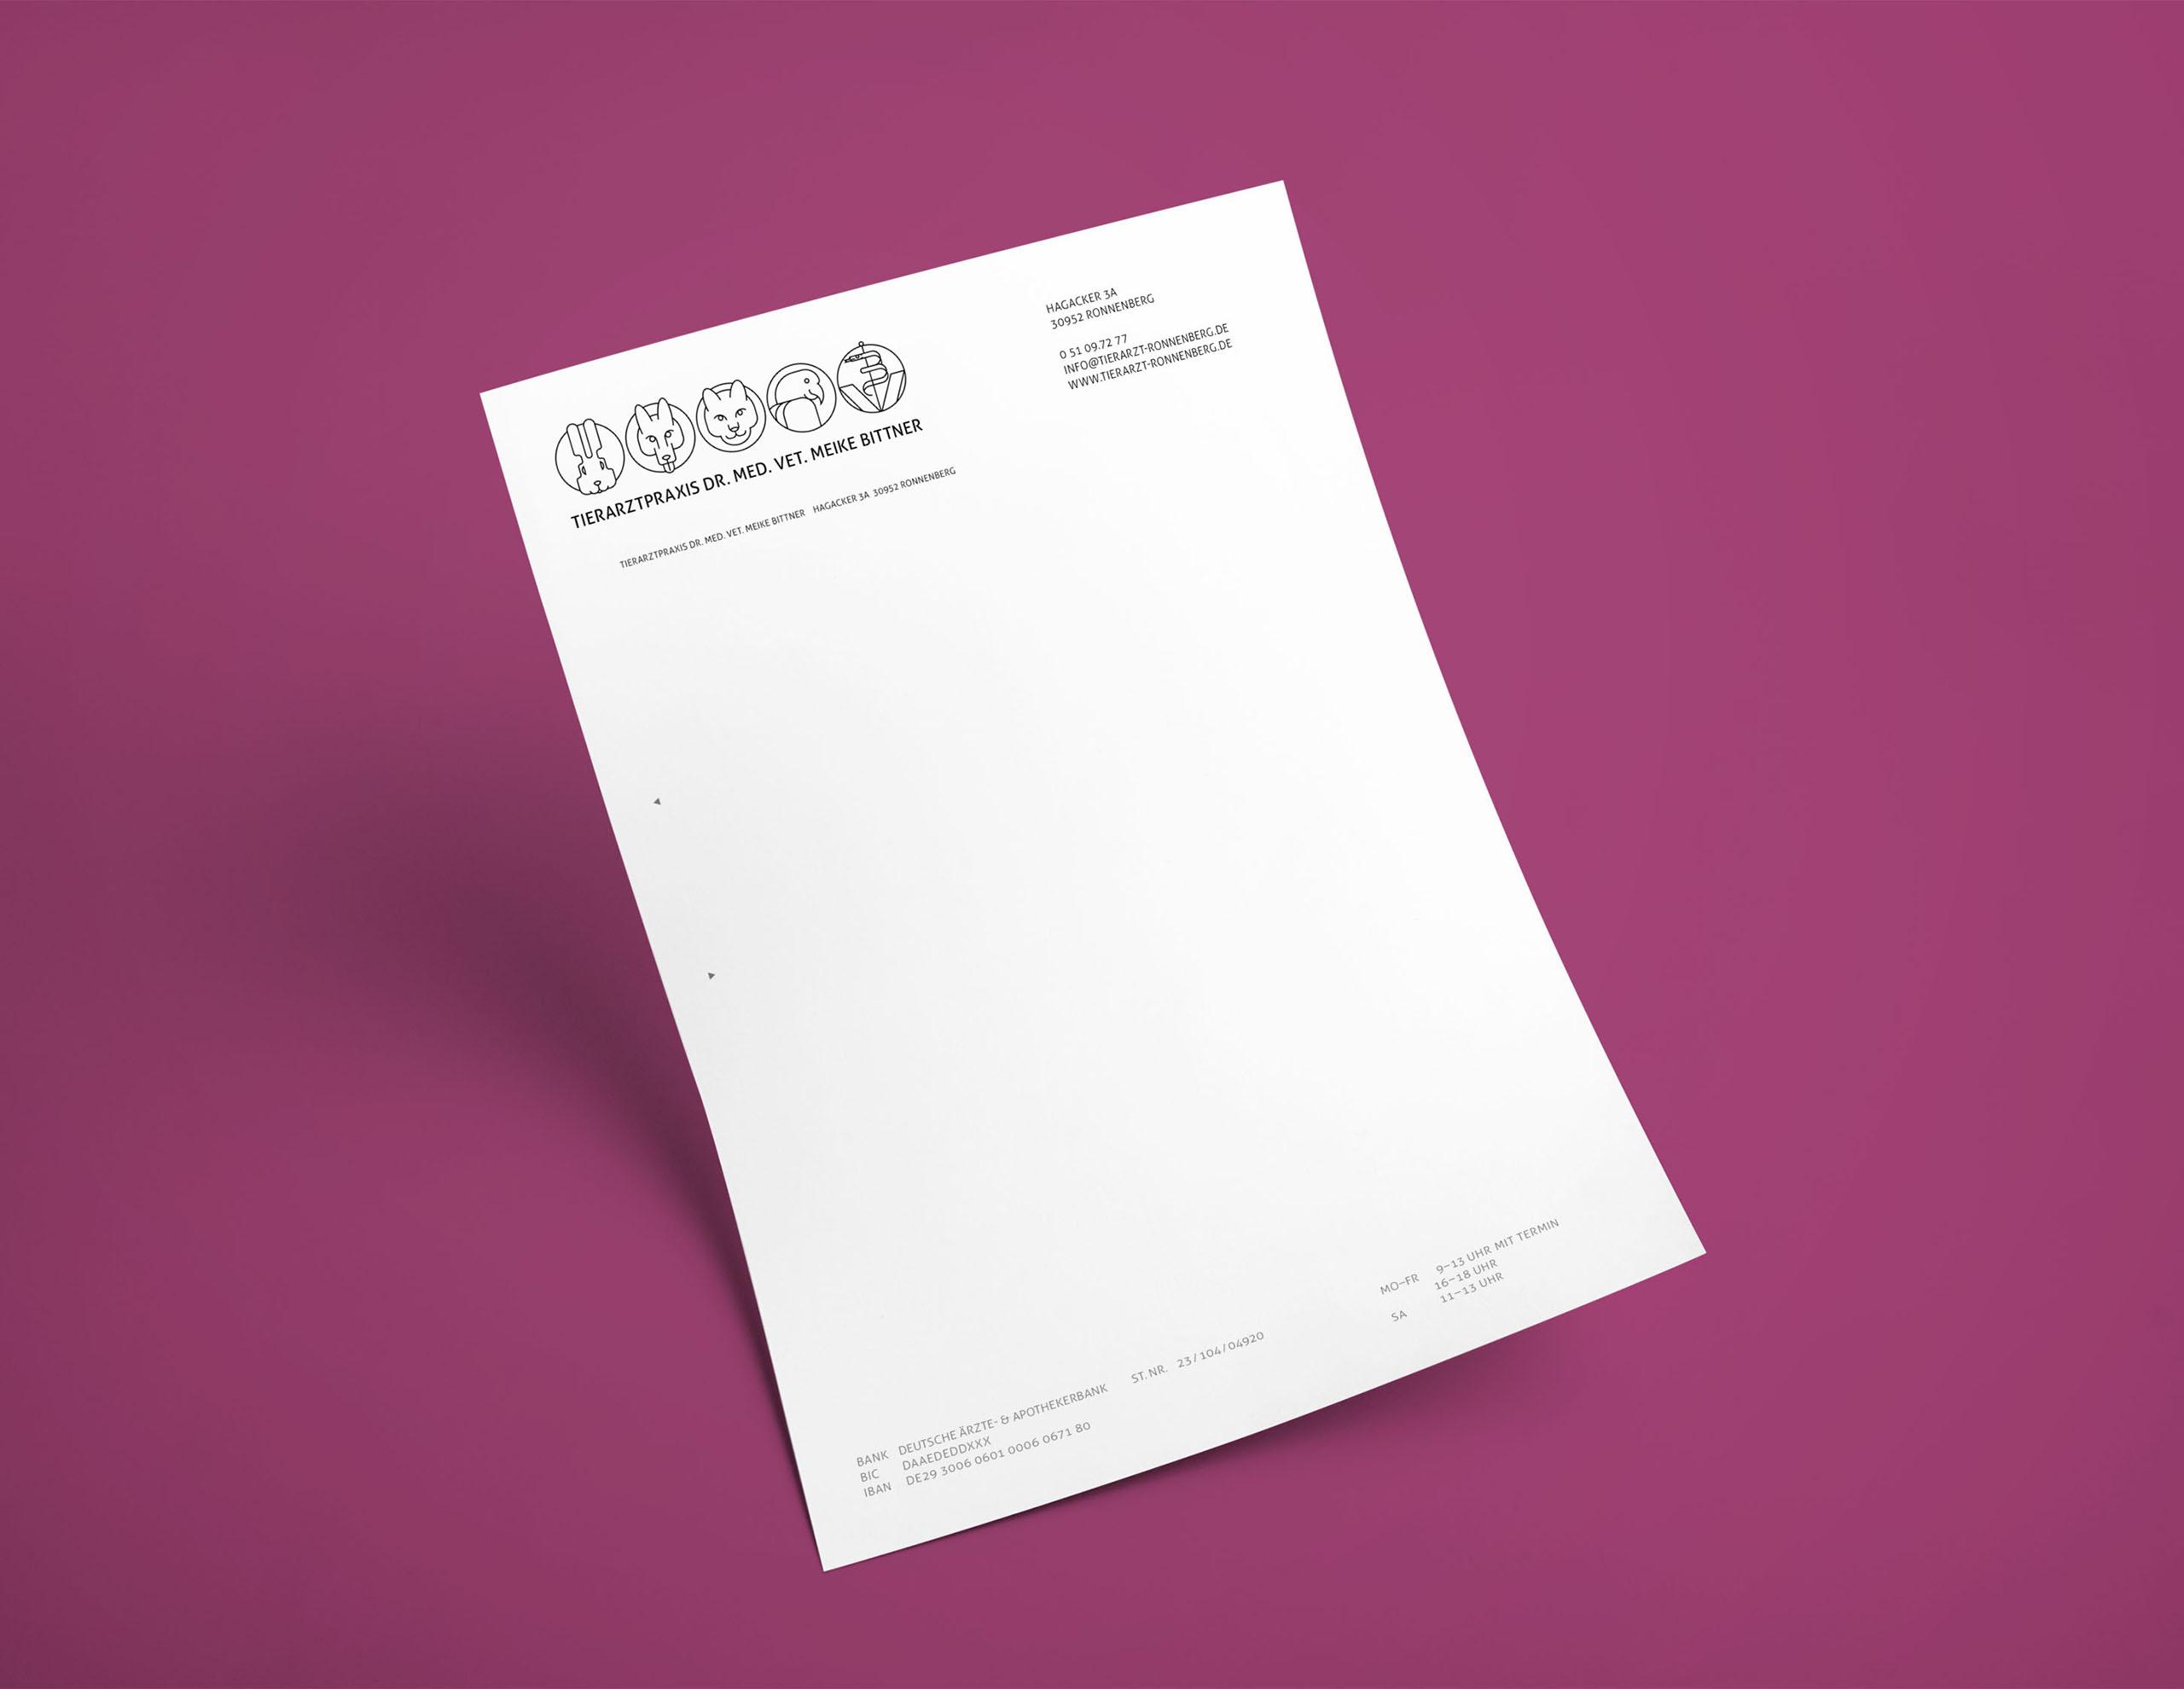 191216_Bittner_A4 Paper PSD MockUp_2560x1920